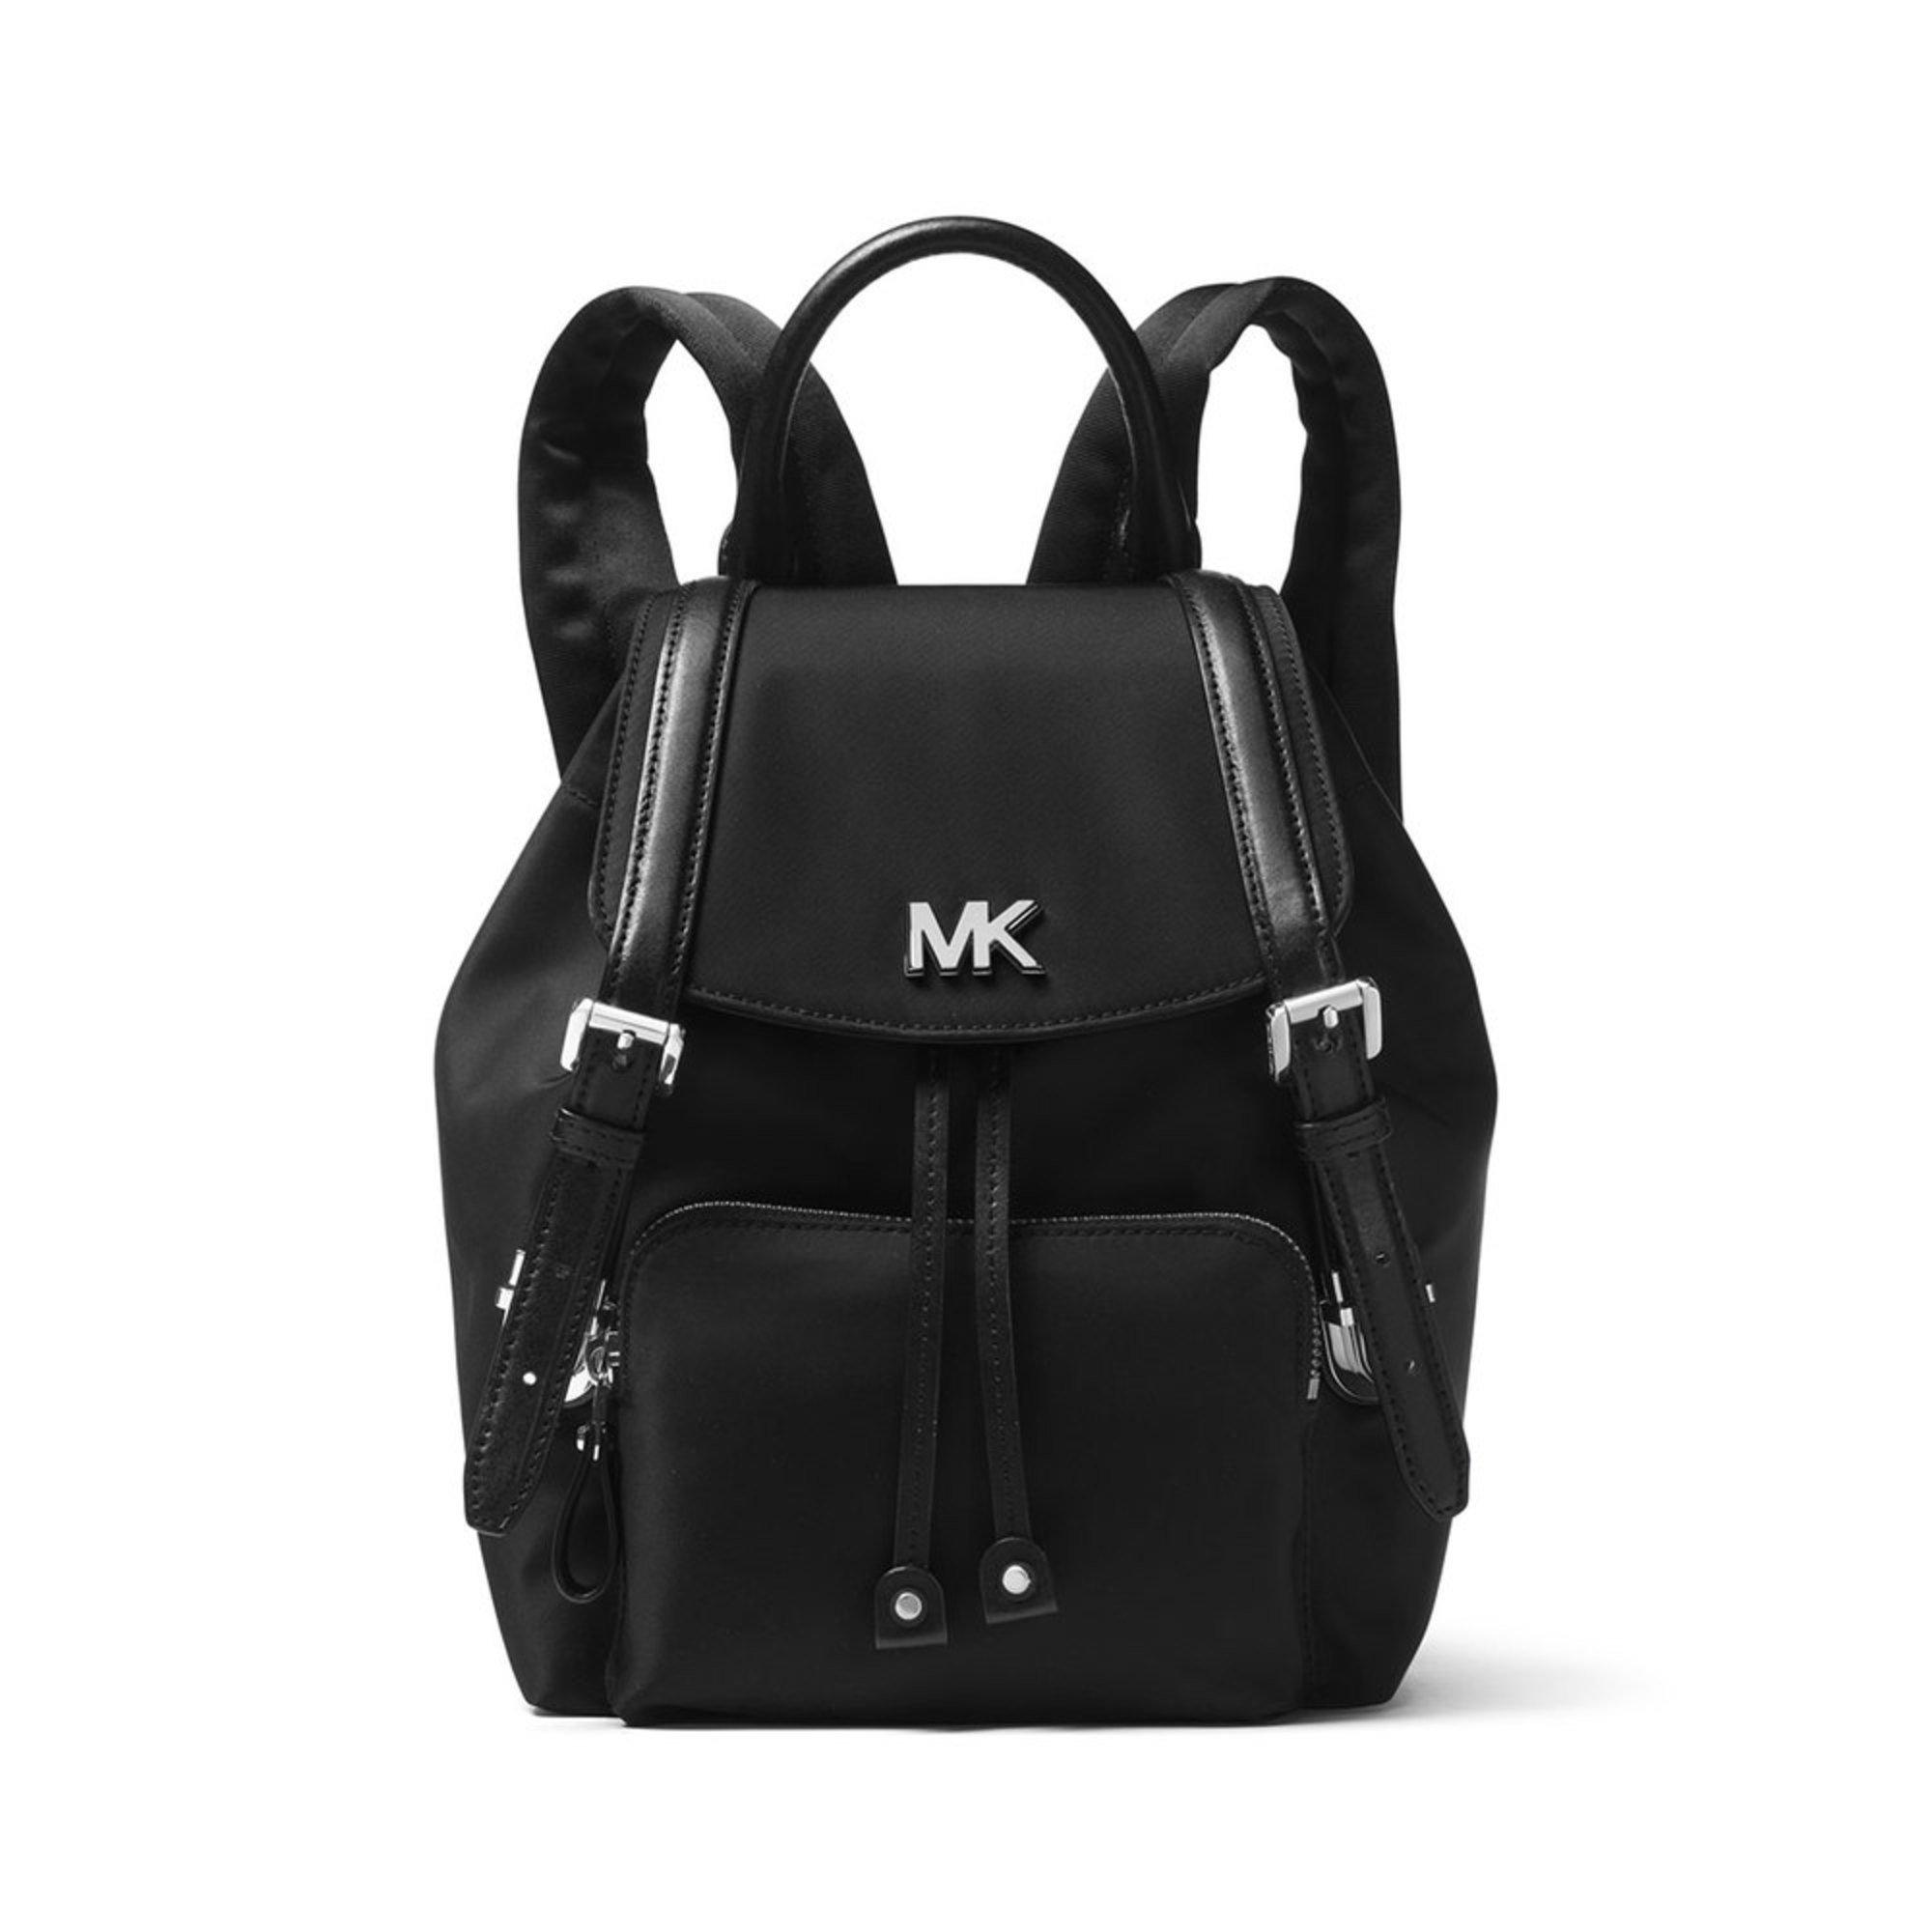 d6e9d380c499 ... 50% off michael kors beacon small backpack black womens backpacks 09bfa  f2a2a